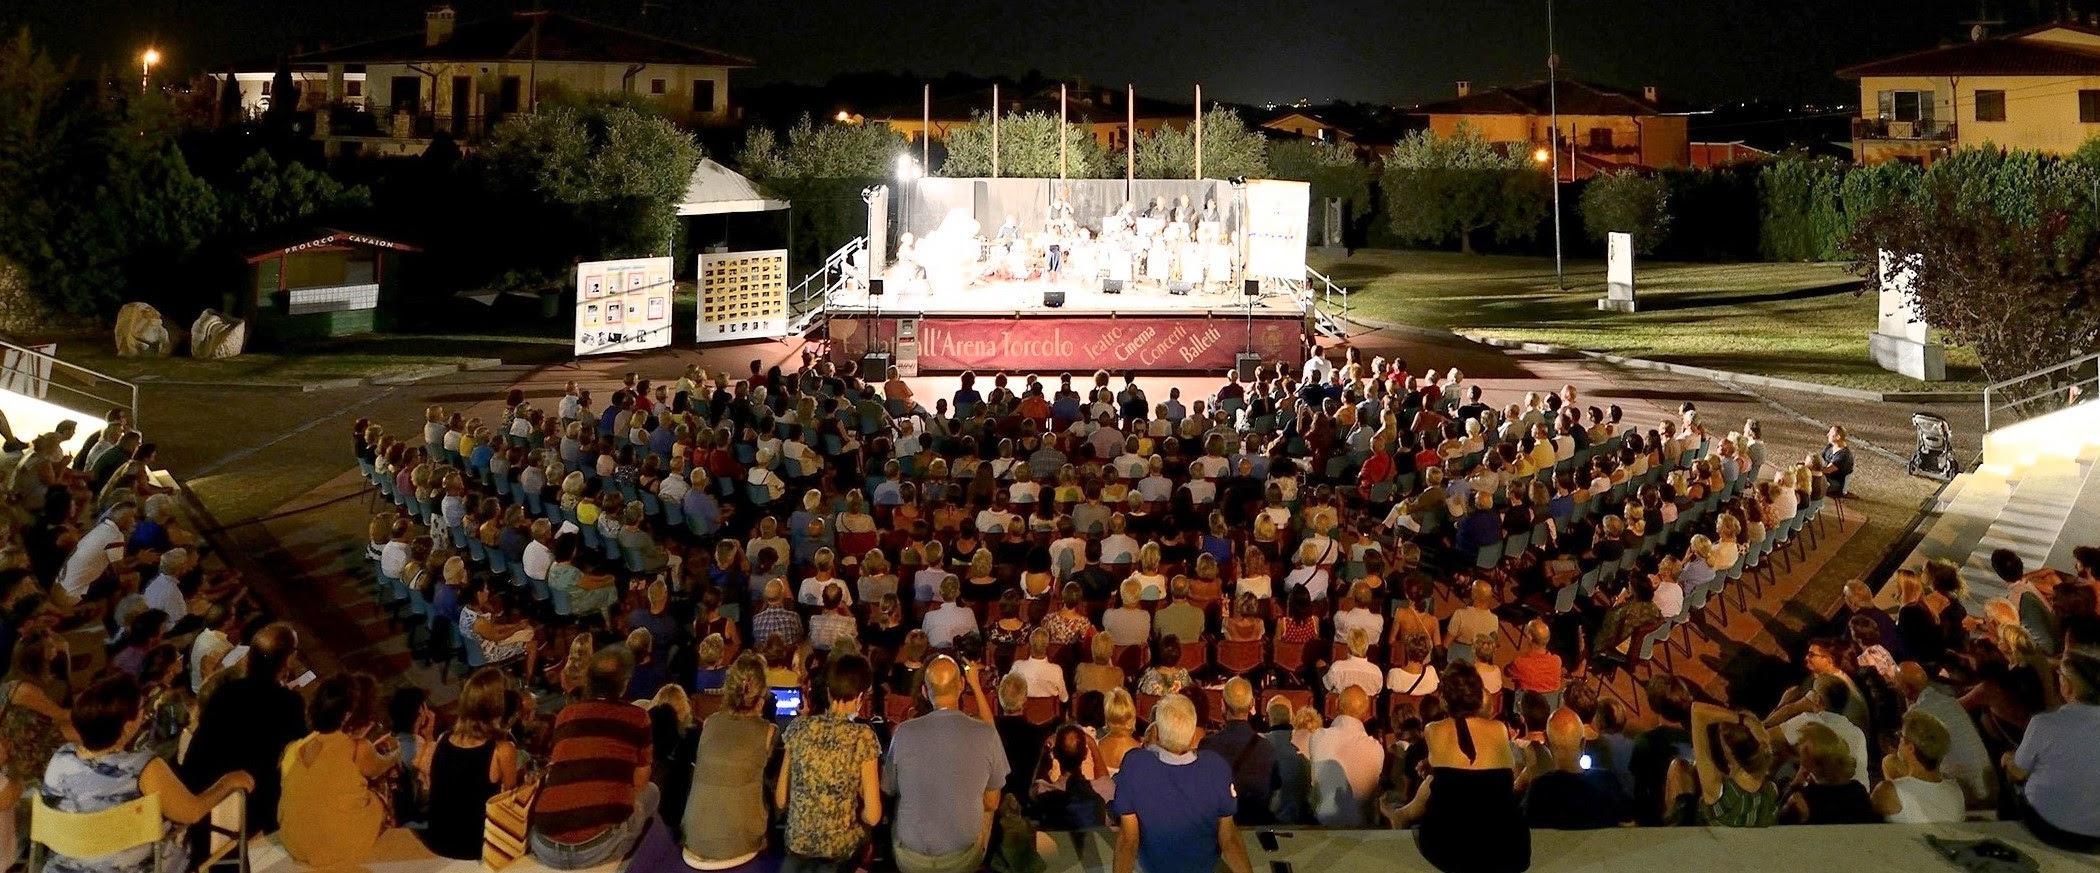 Teatro Torcolo